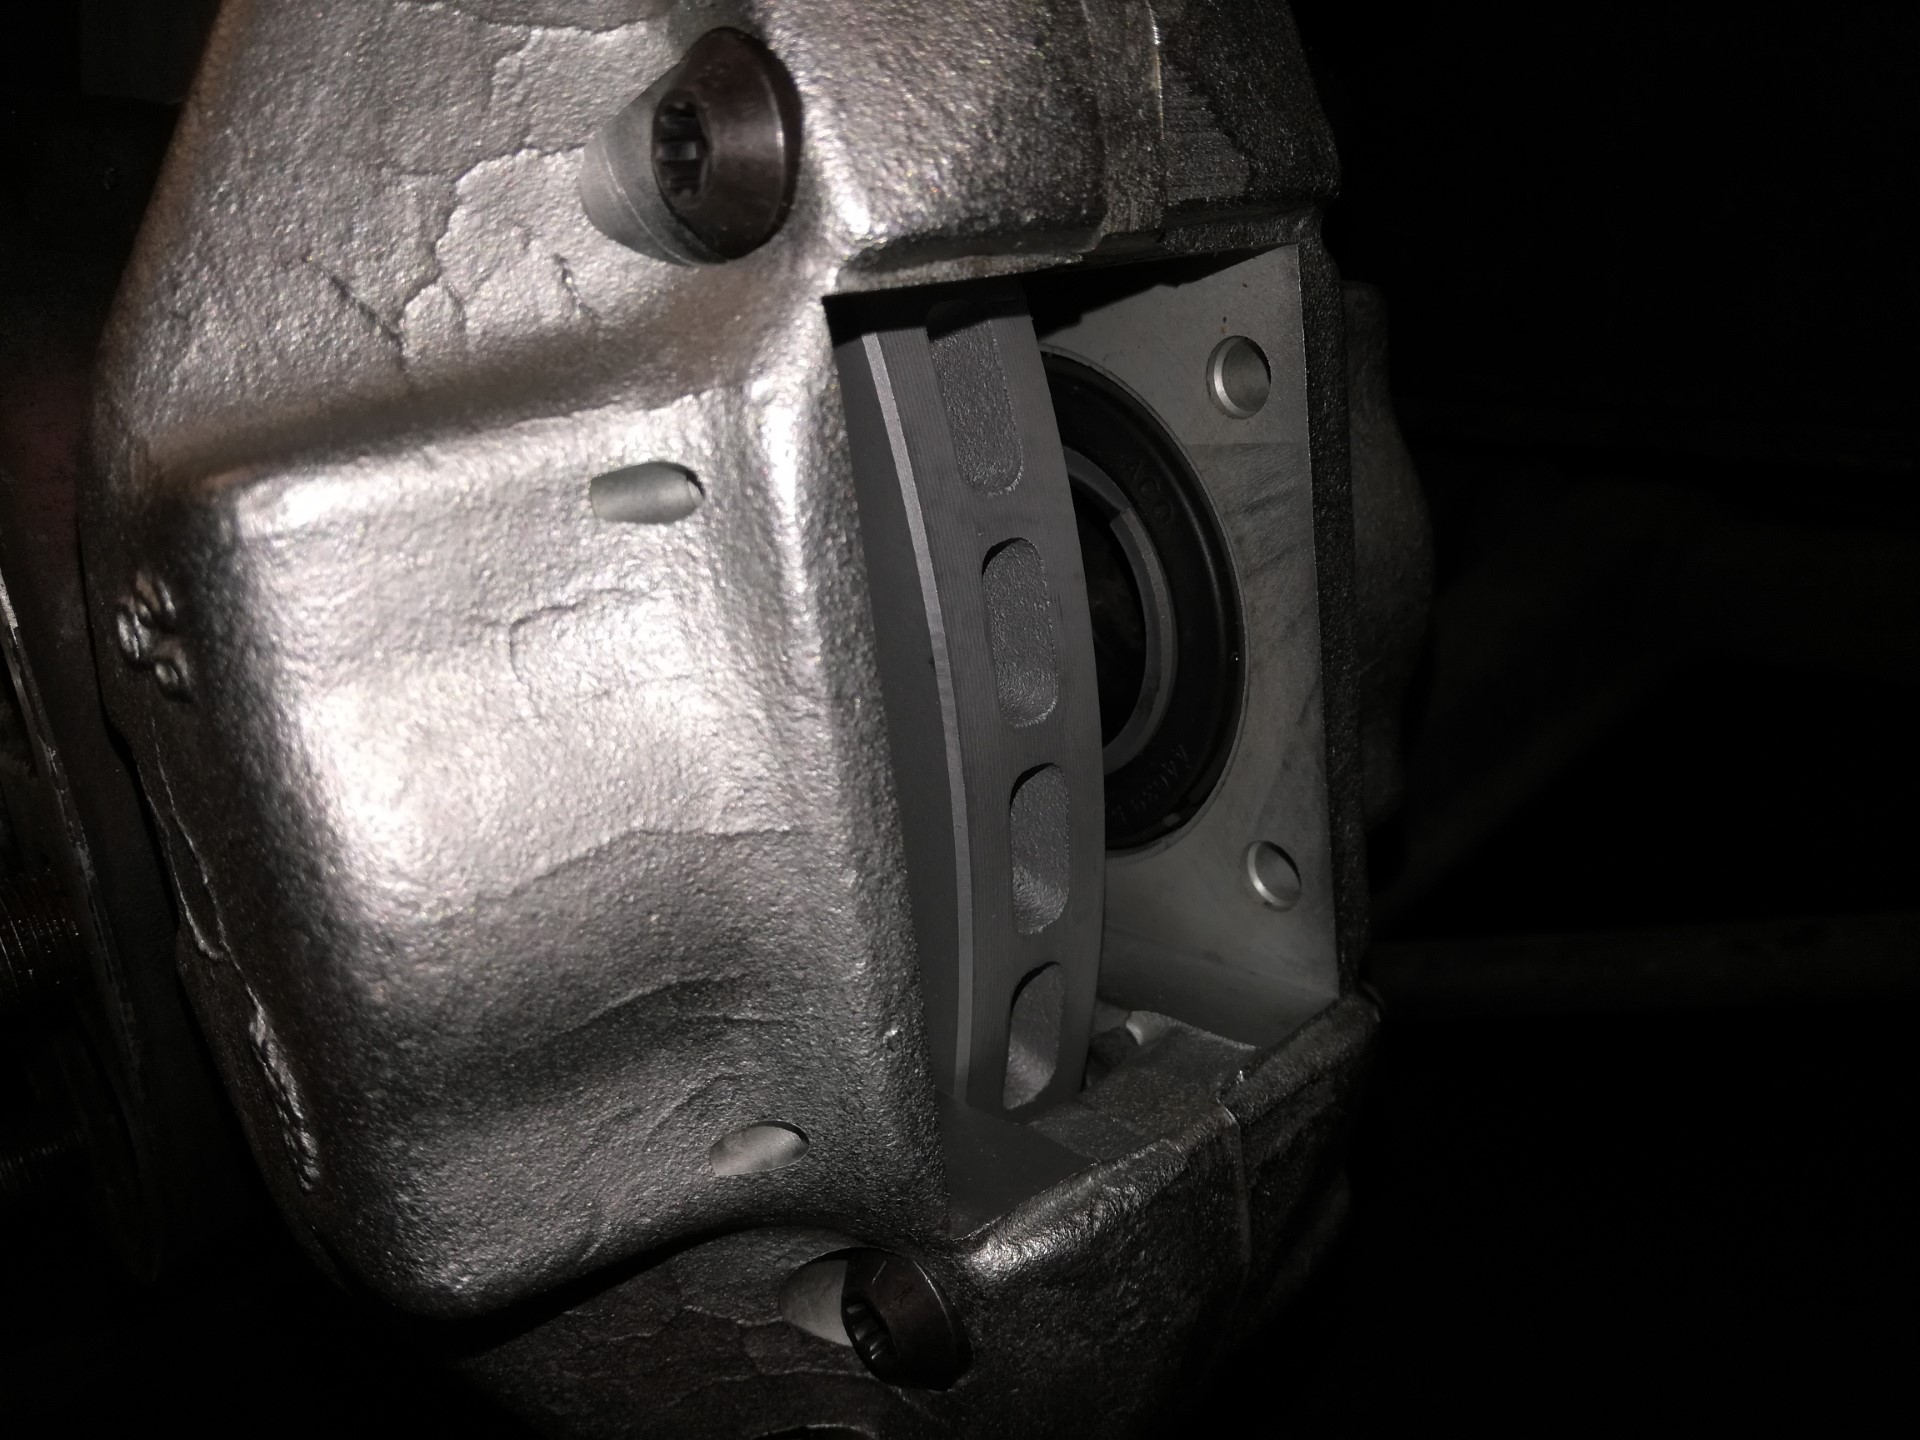 Air-cooled Porsche 911 front caliper replacement